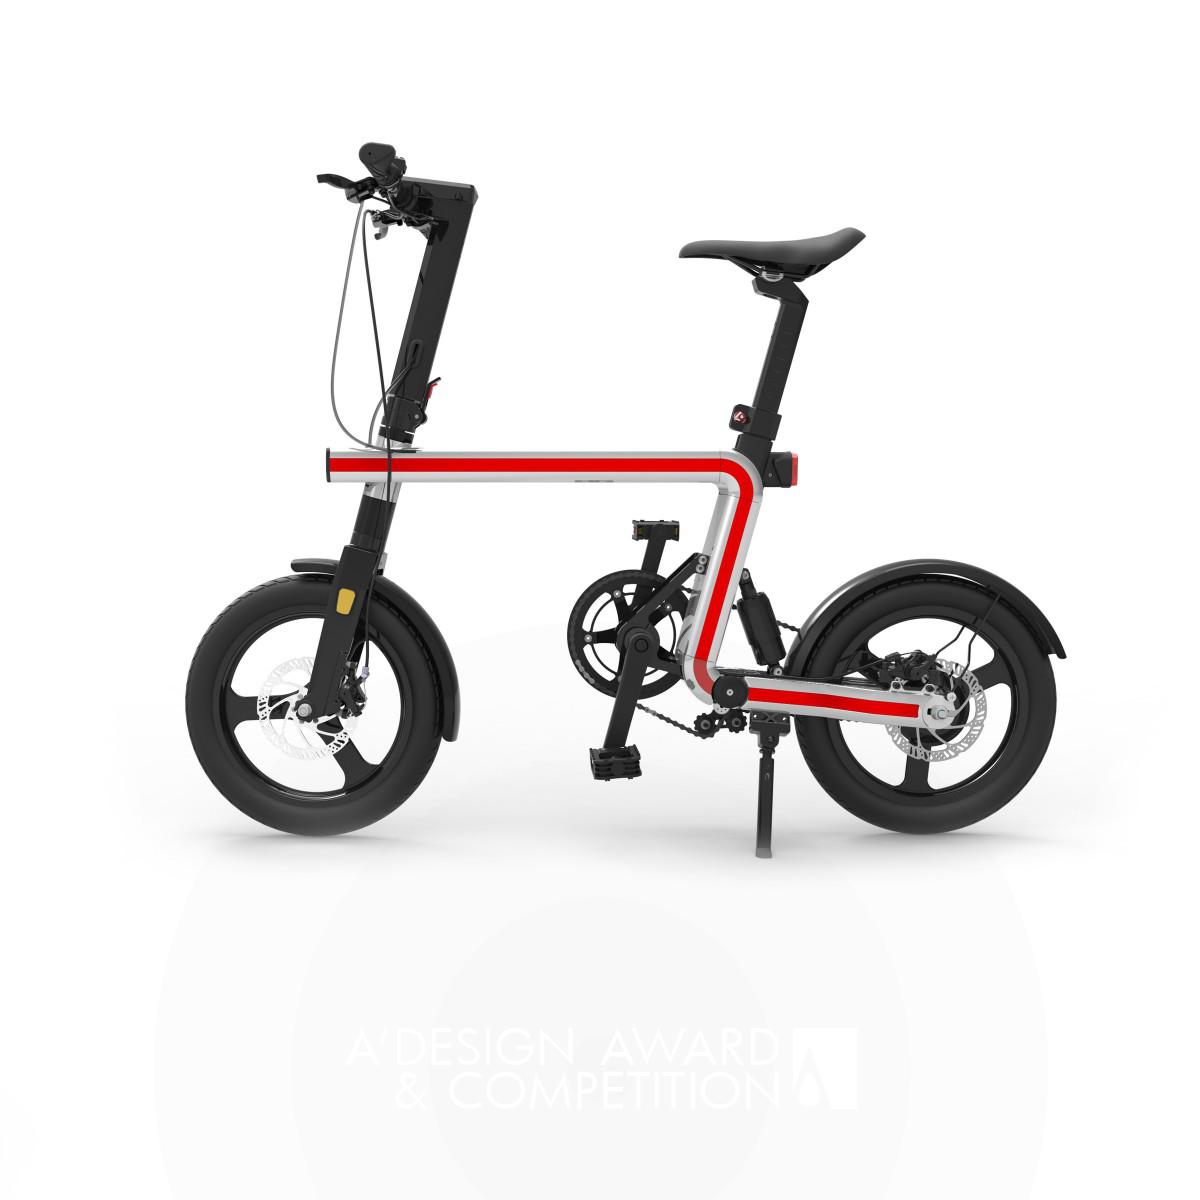 Ozoa Electric Bicycle